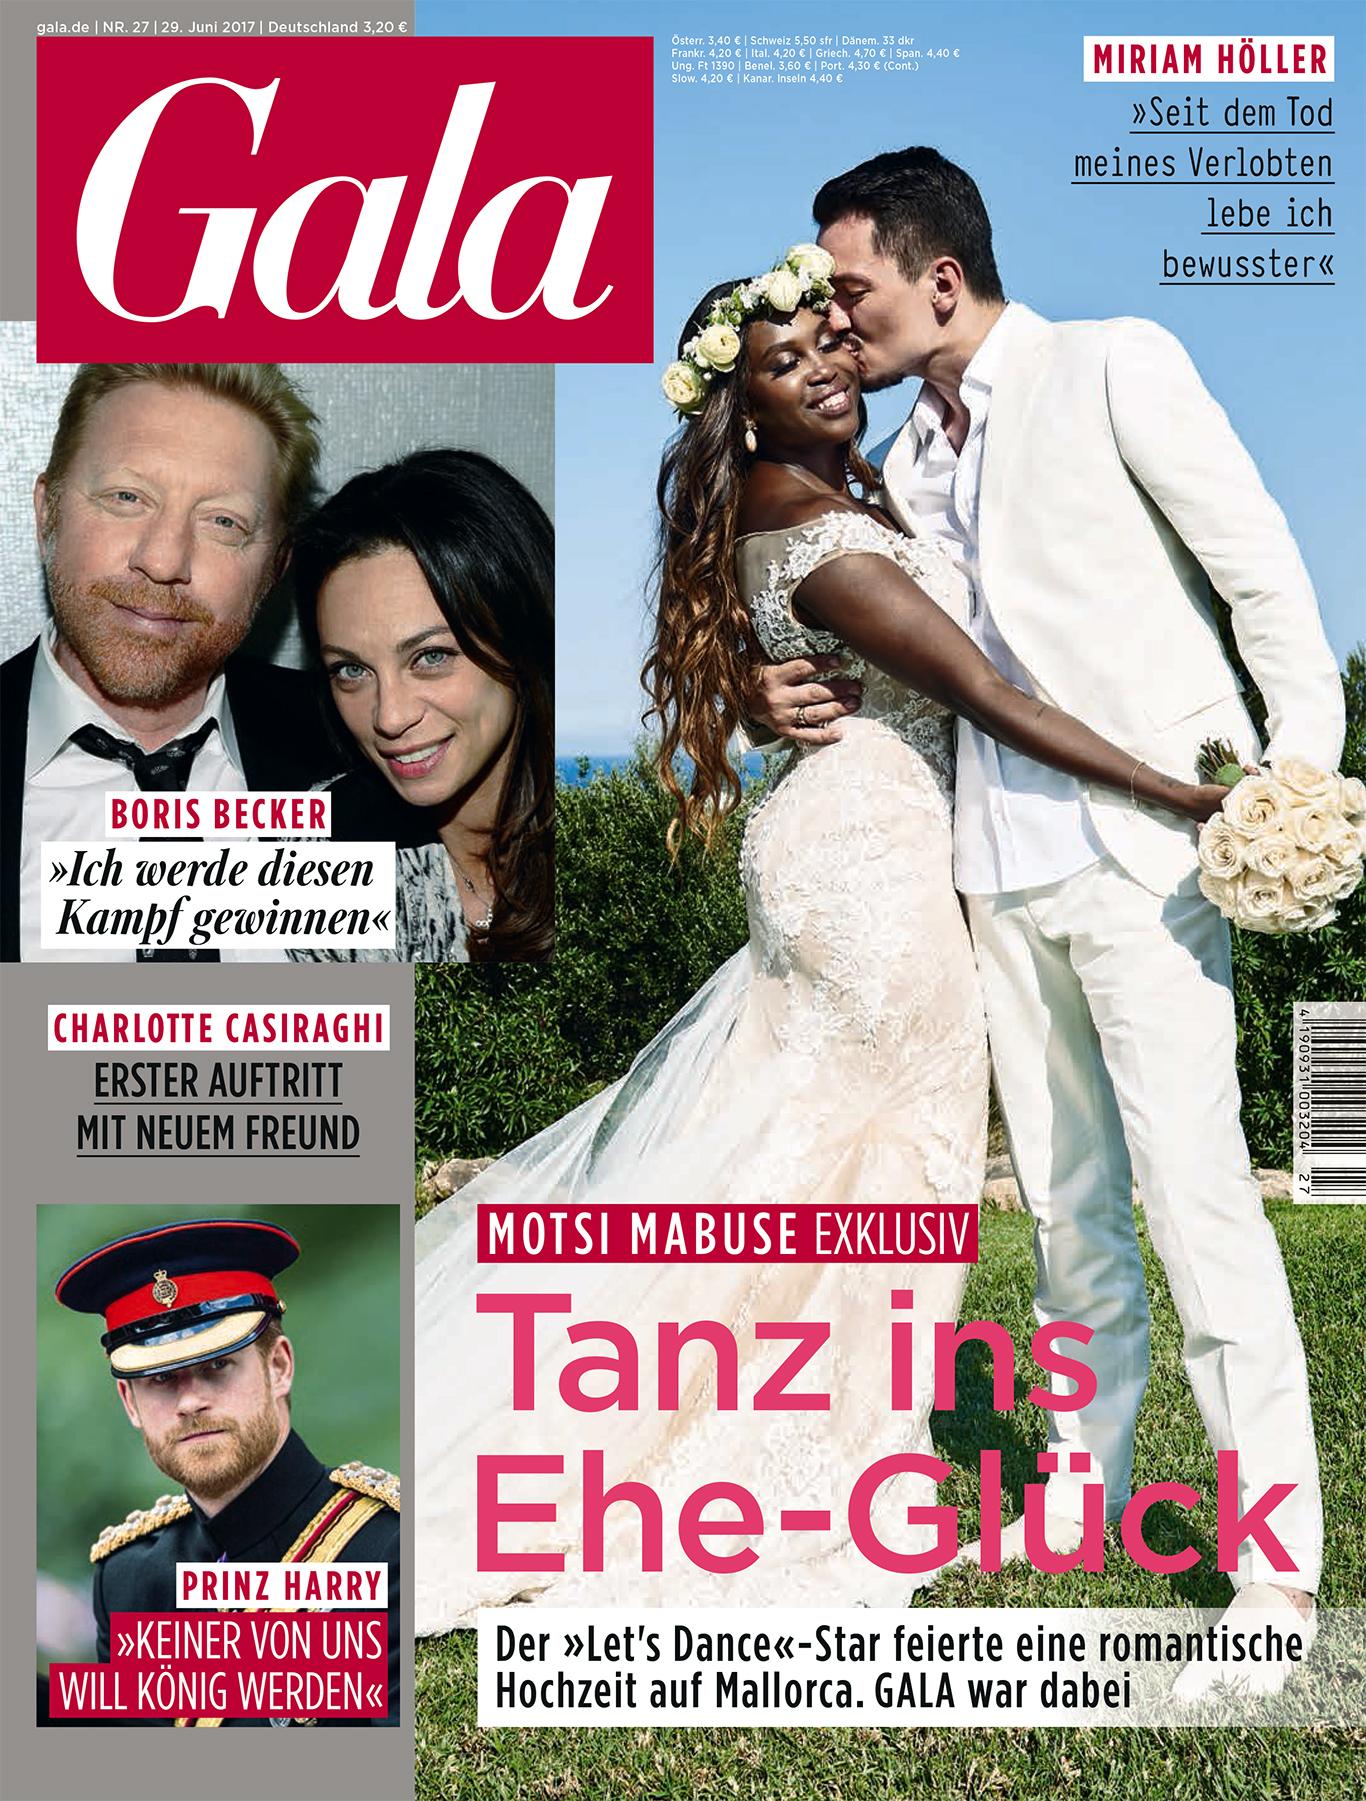 ▷ Exklusiv in GALA: Motsi Mabuse hat geheiratet | Presseportal